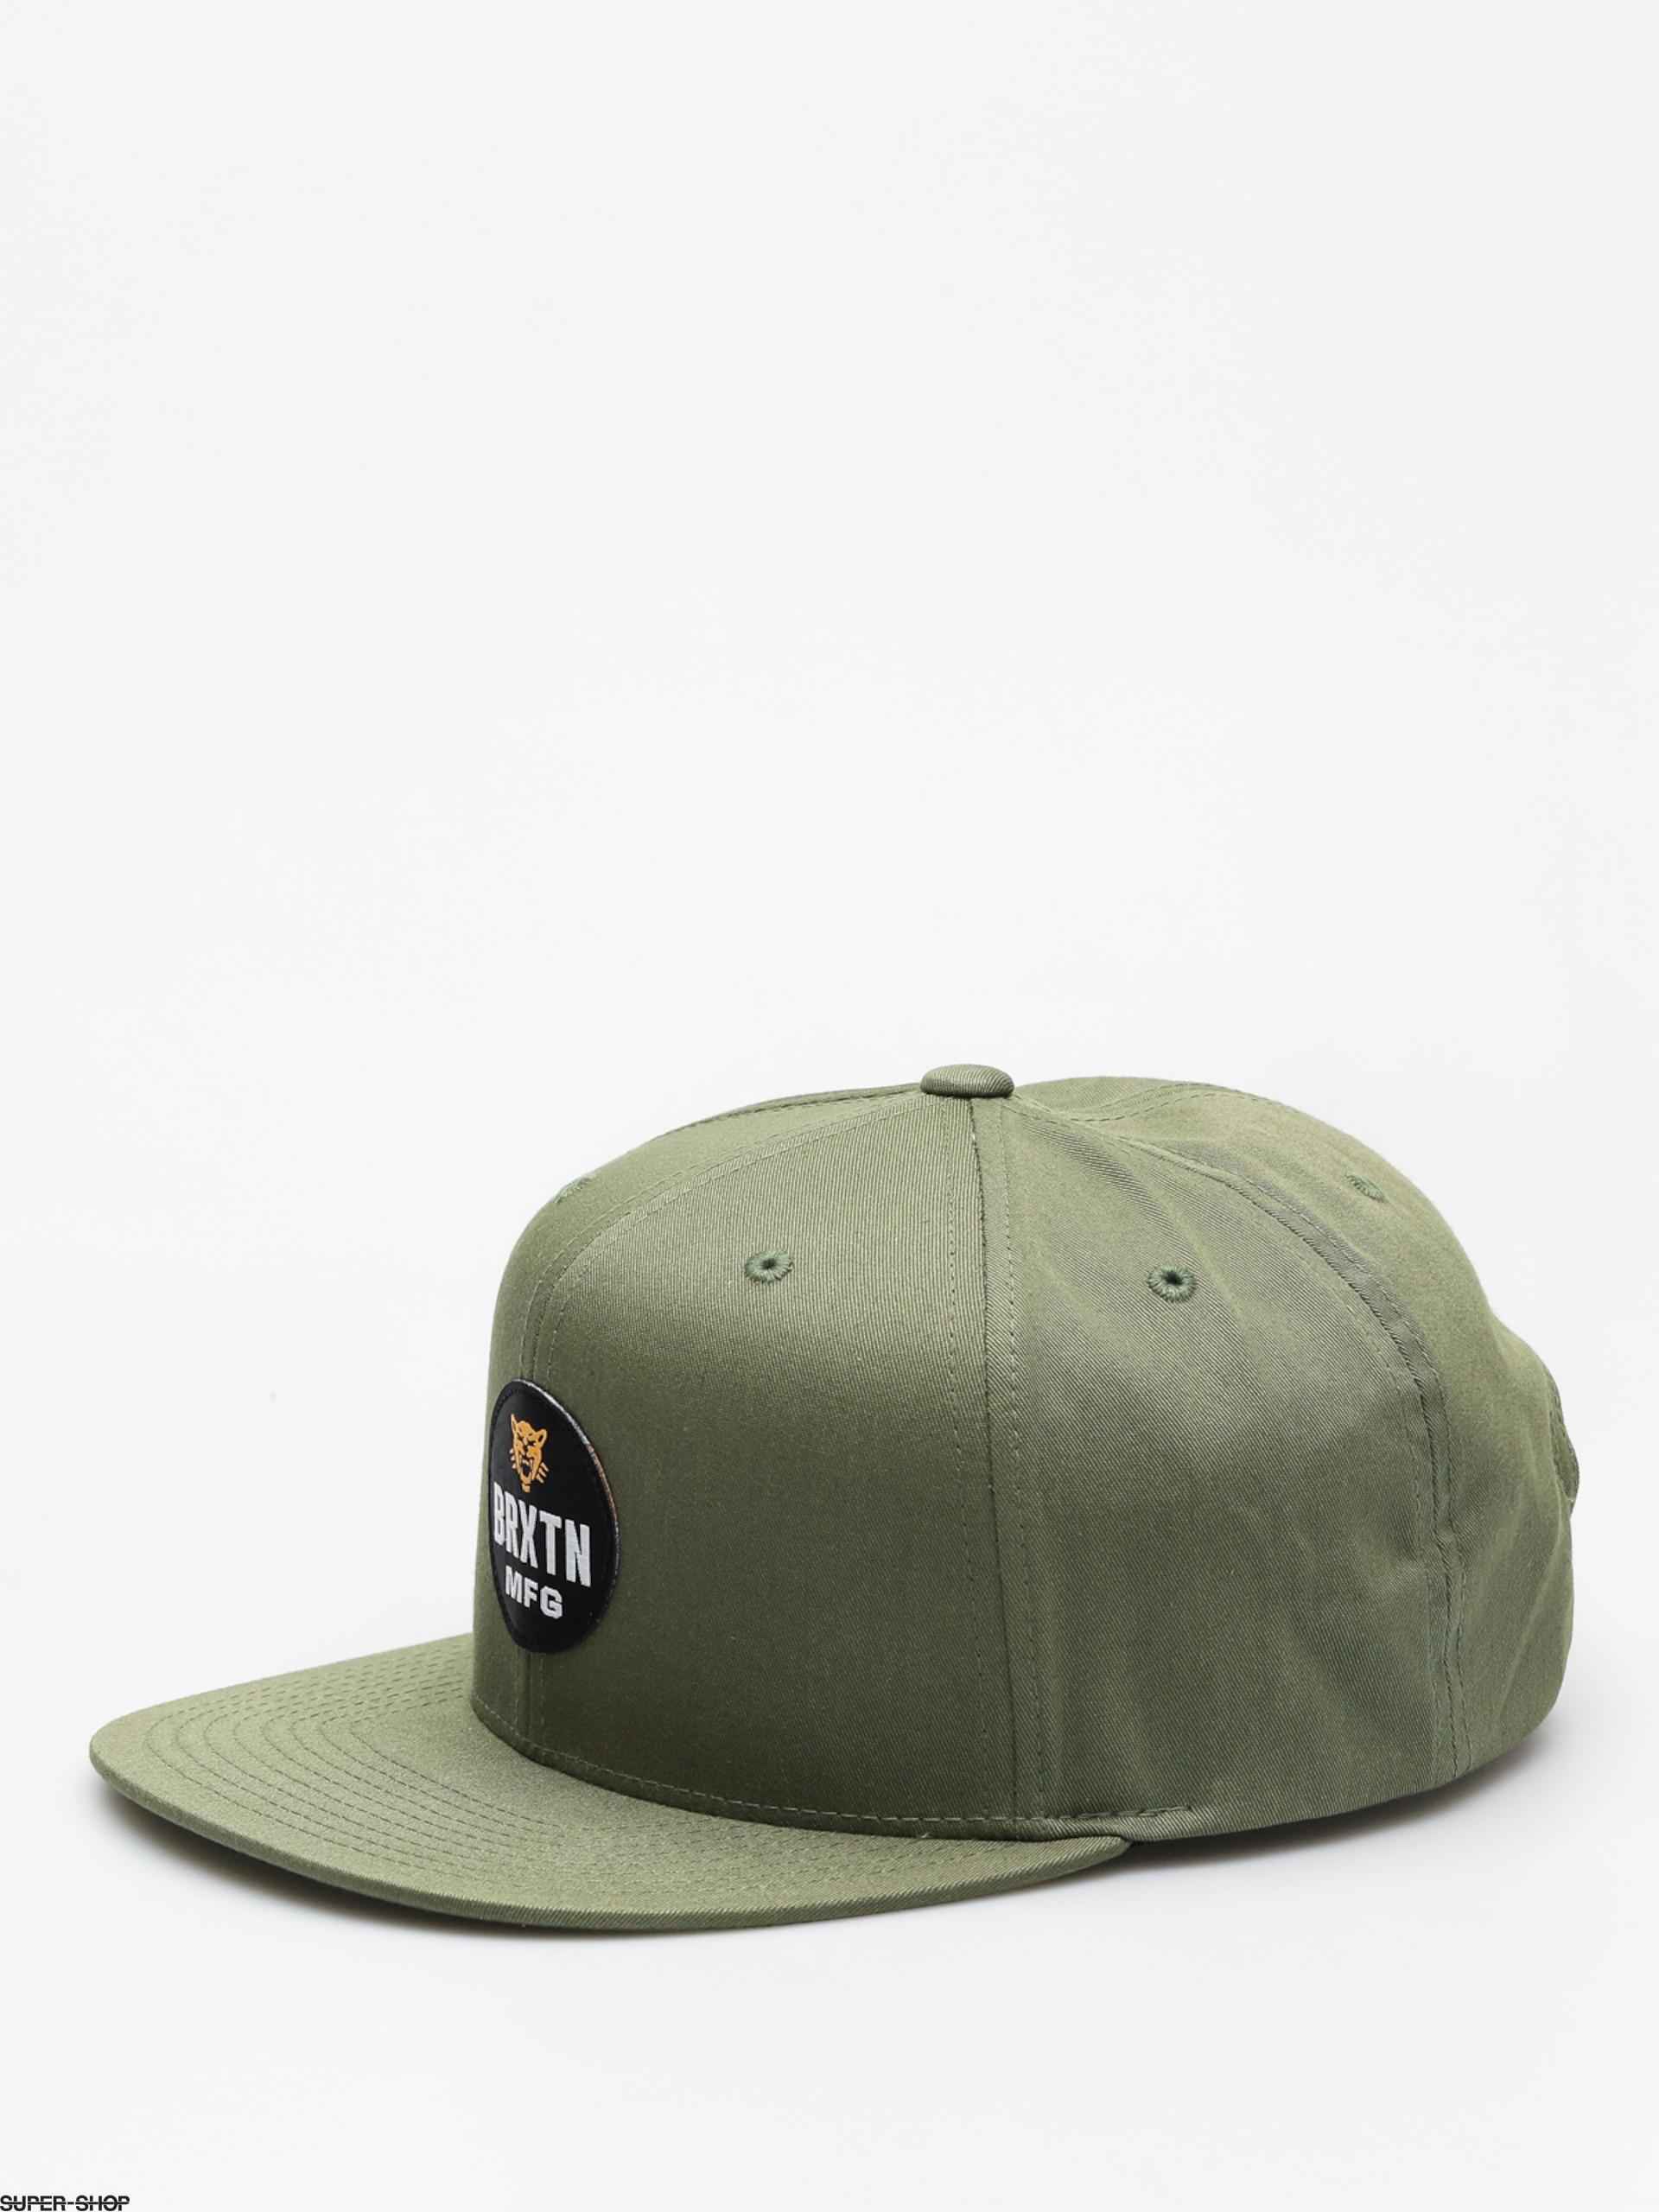 60e01c61a32 Olive green accessories dad hat vans jpg 1200x1600 Olive green accessories  dad hat vans